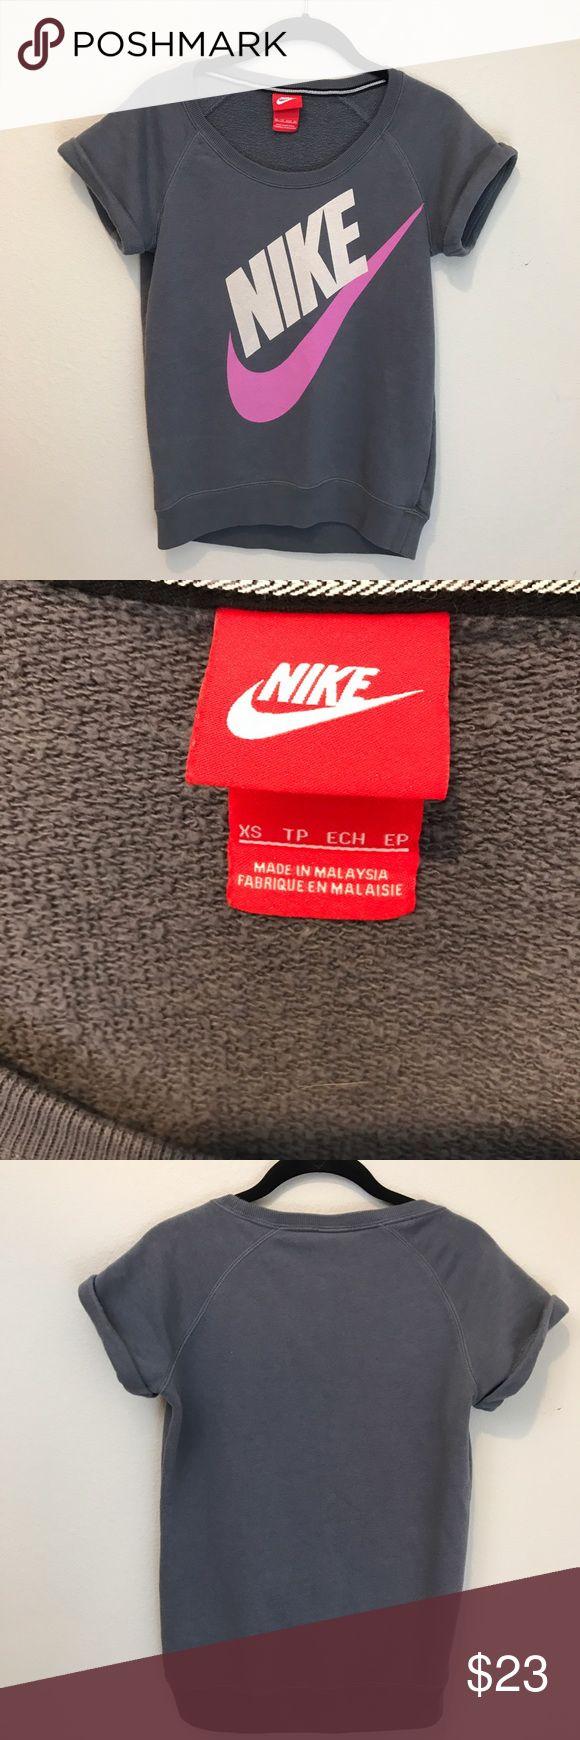 Nike Roll Sleeve Sweatshirt size XS Cute retro style Nike sweatshirt.  Short rolled sleeves in a medium gray color with a purple swoosh. Nike Tops Sweatshirts & Hoodies